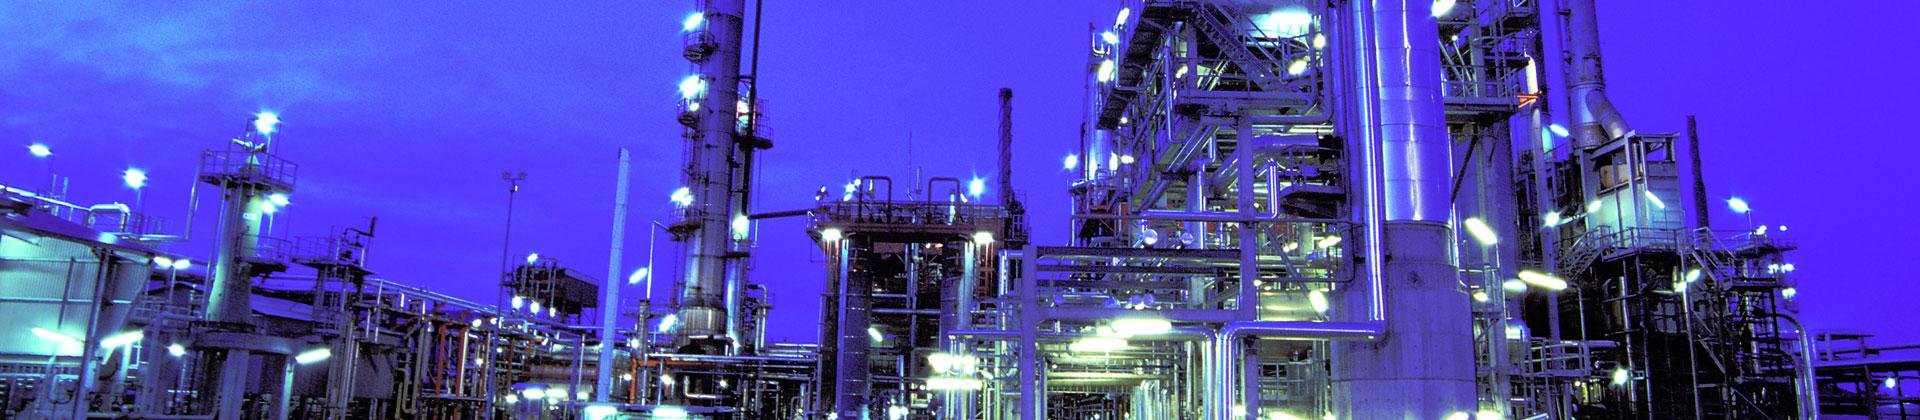 chem_oil